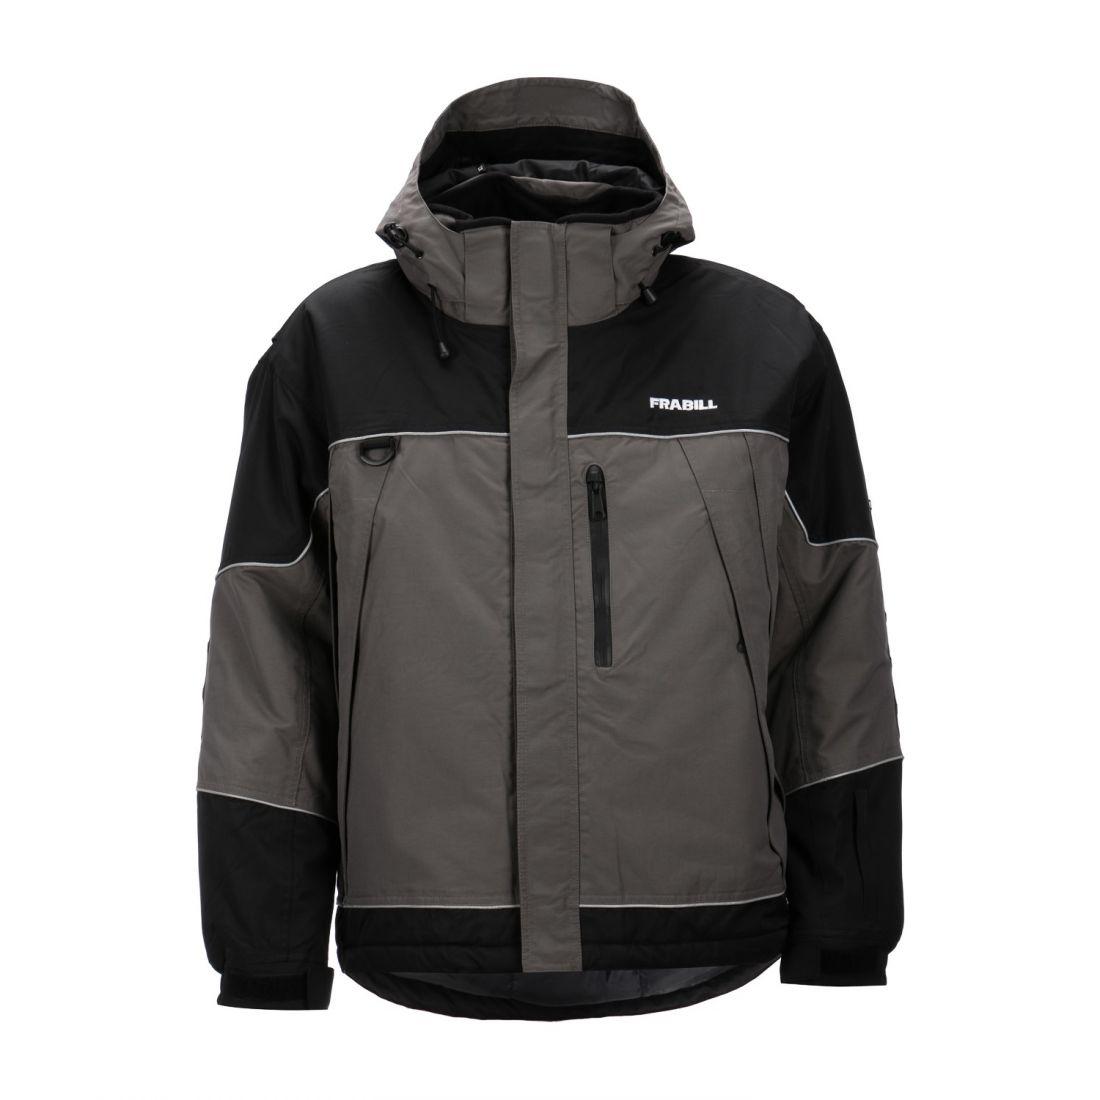 Куртка зимняя FRABILL FXE SNOSUIT JACKET GRAY размер M